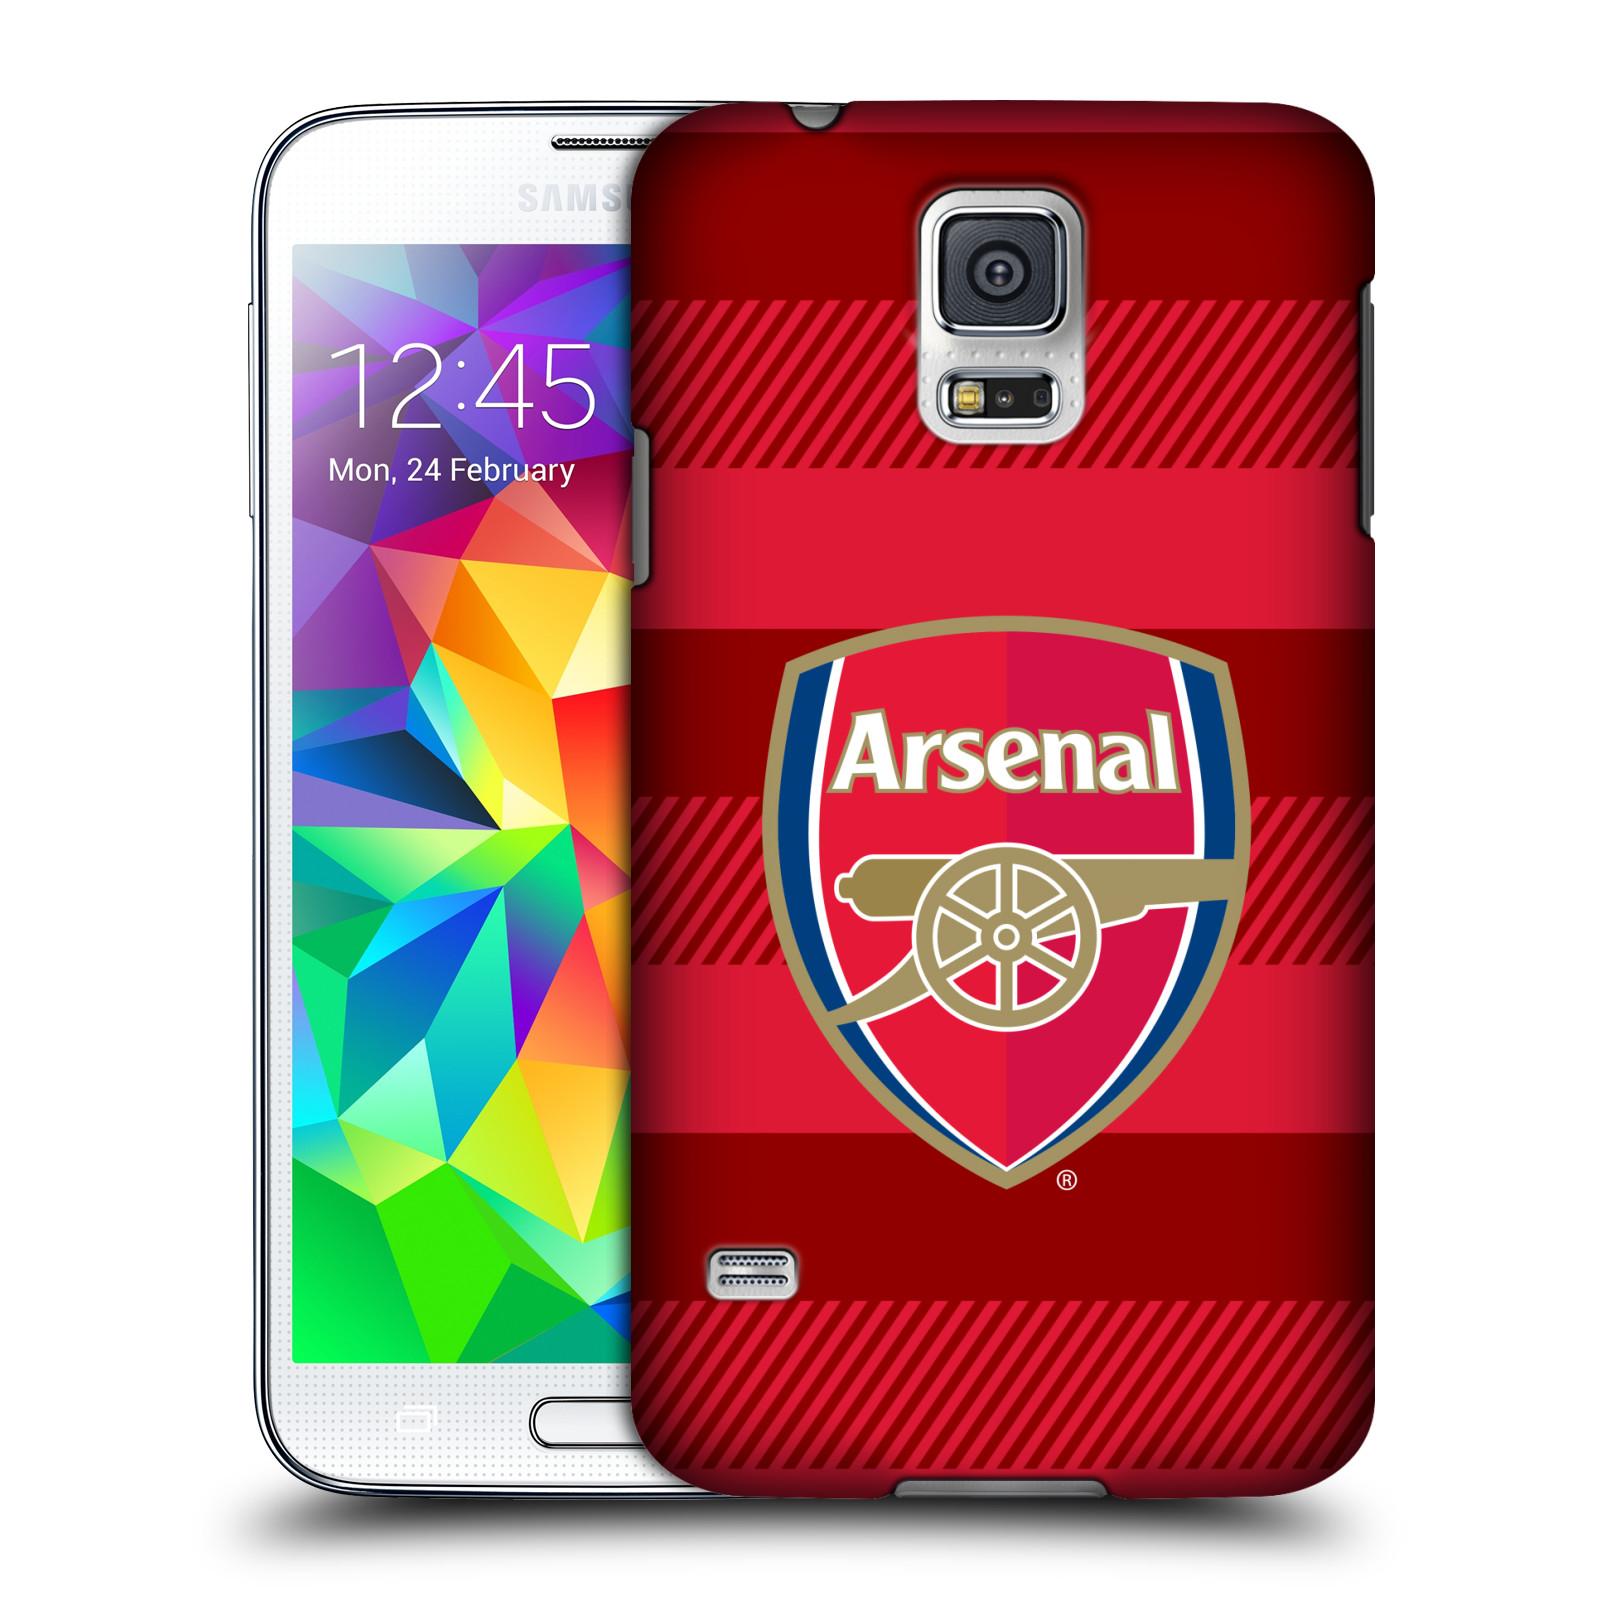 Plastové pouzdro na mobil Samsung Galaxy S5 - Head Case - Arsenal FC - Logo s pruhy